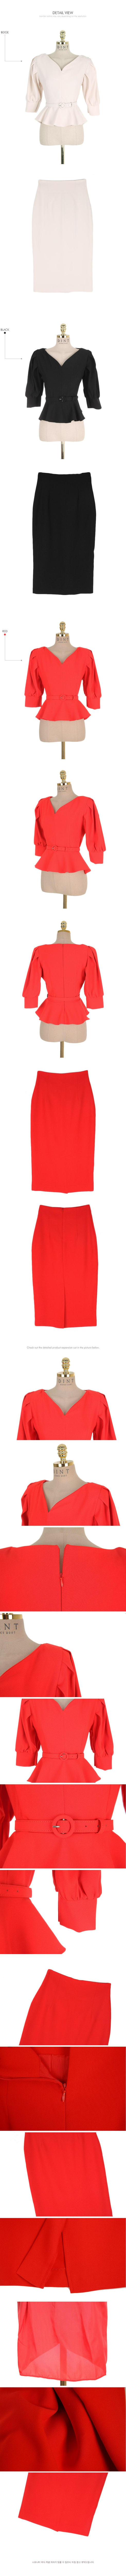 Váy Peplum Bộ Set - VL6392